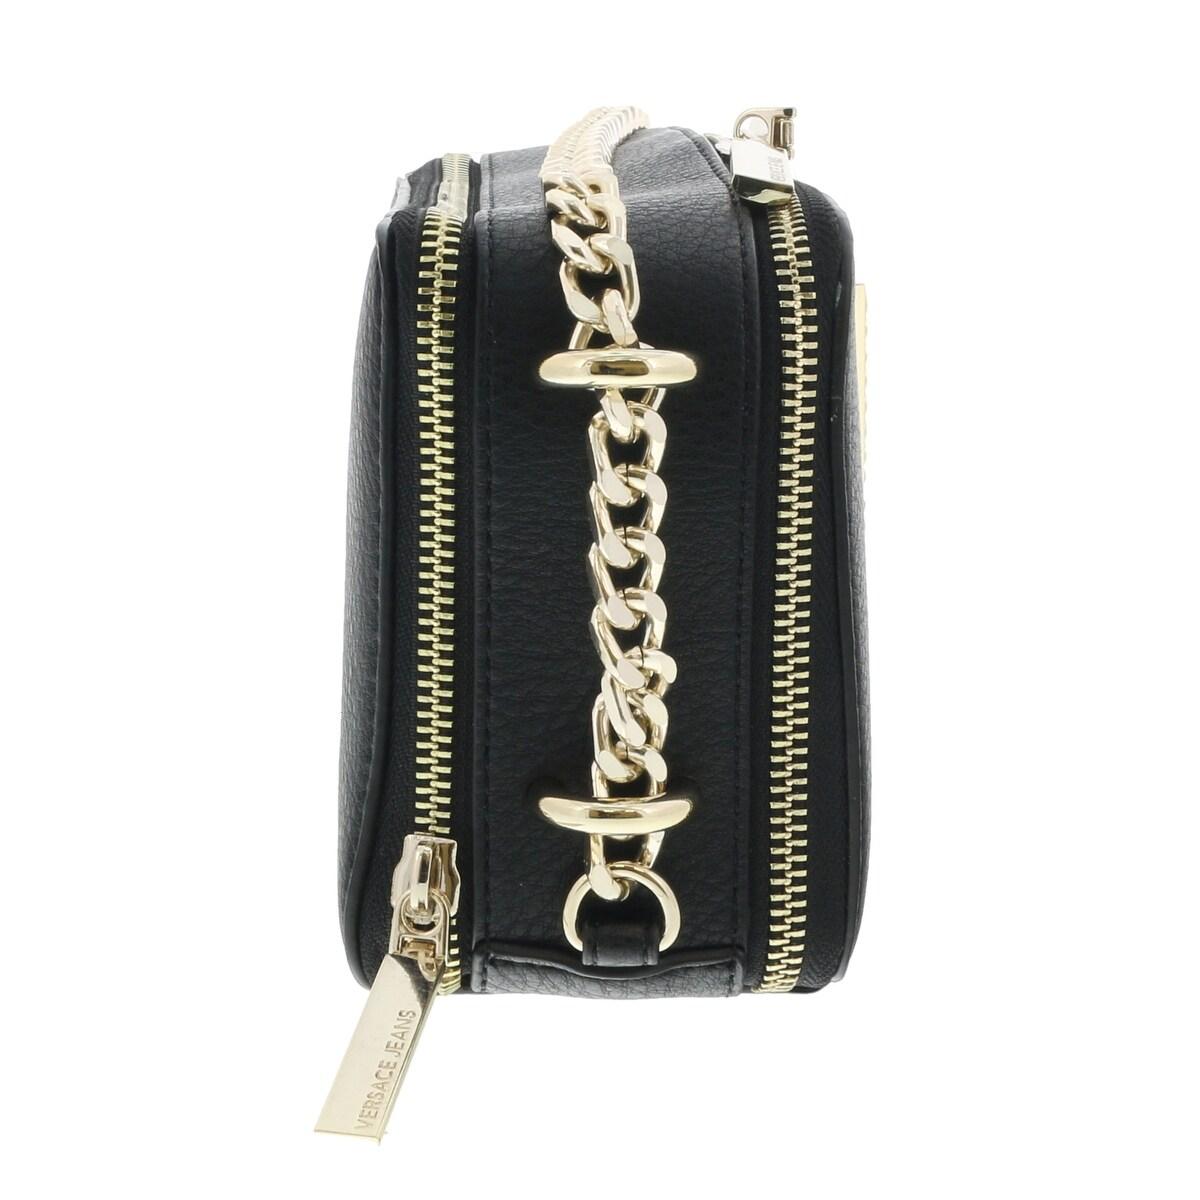 c1827beb49 Shop Versace EE1VRBBC2 Black Shoulder Bag - 8-5-4 - On Sale - Free Shipping  Today - Overstock - 20223849